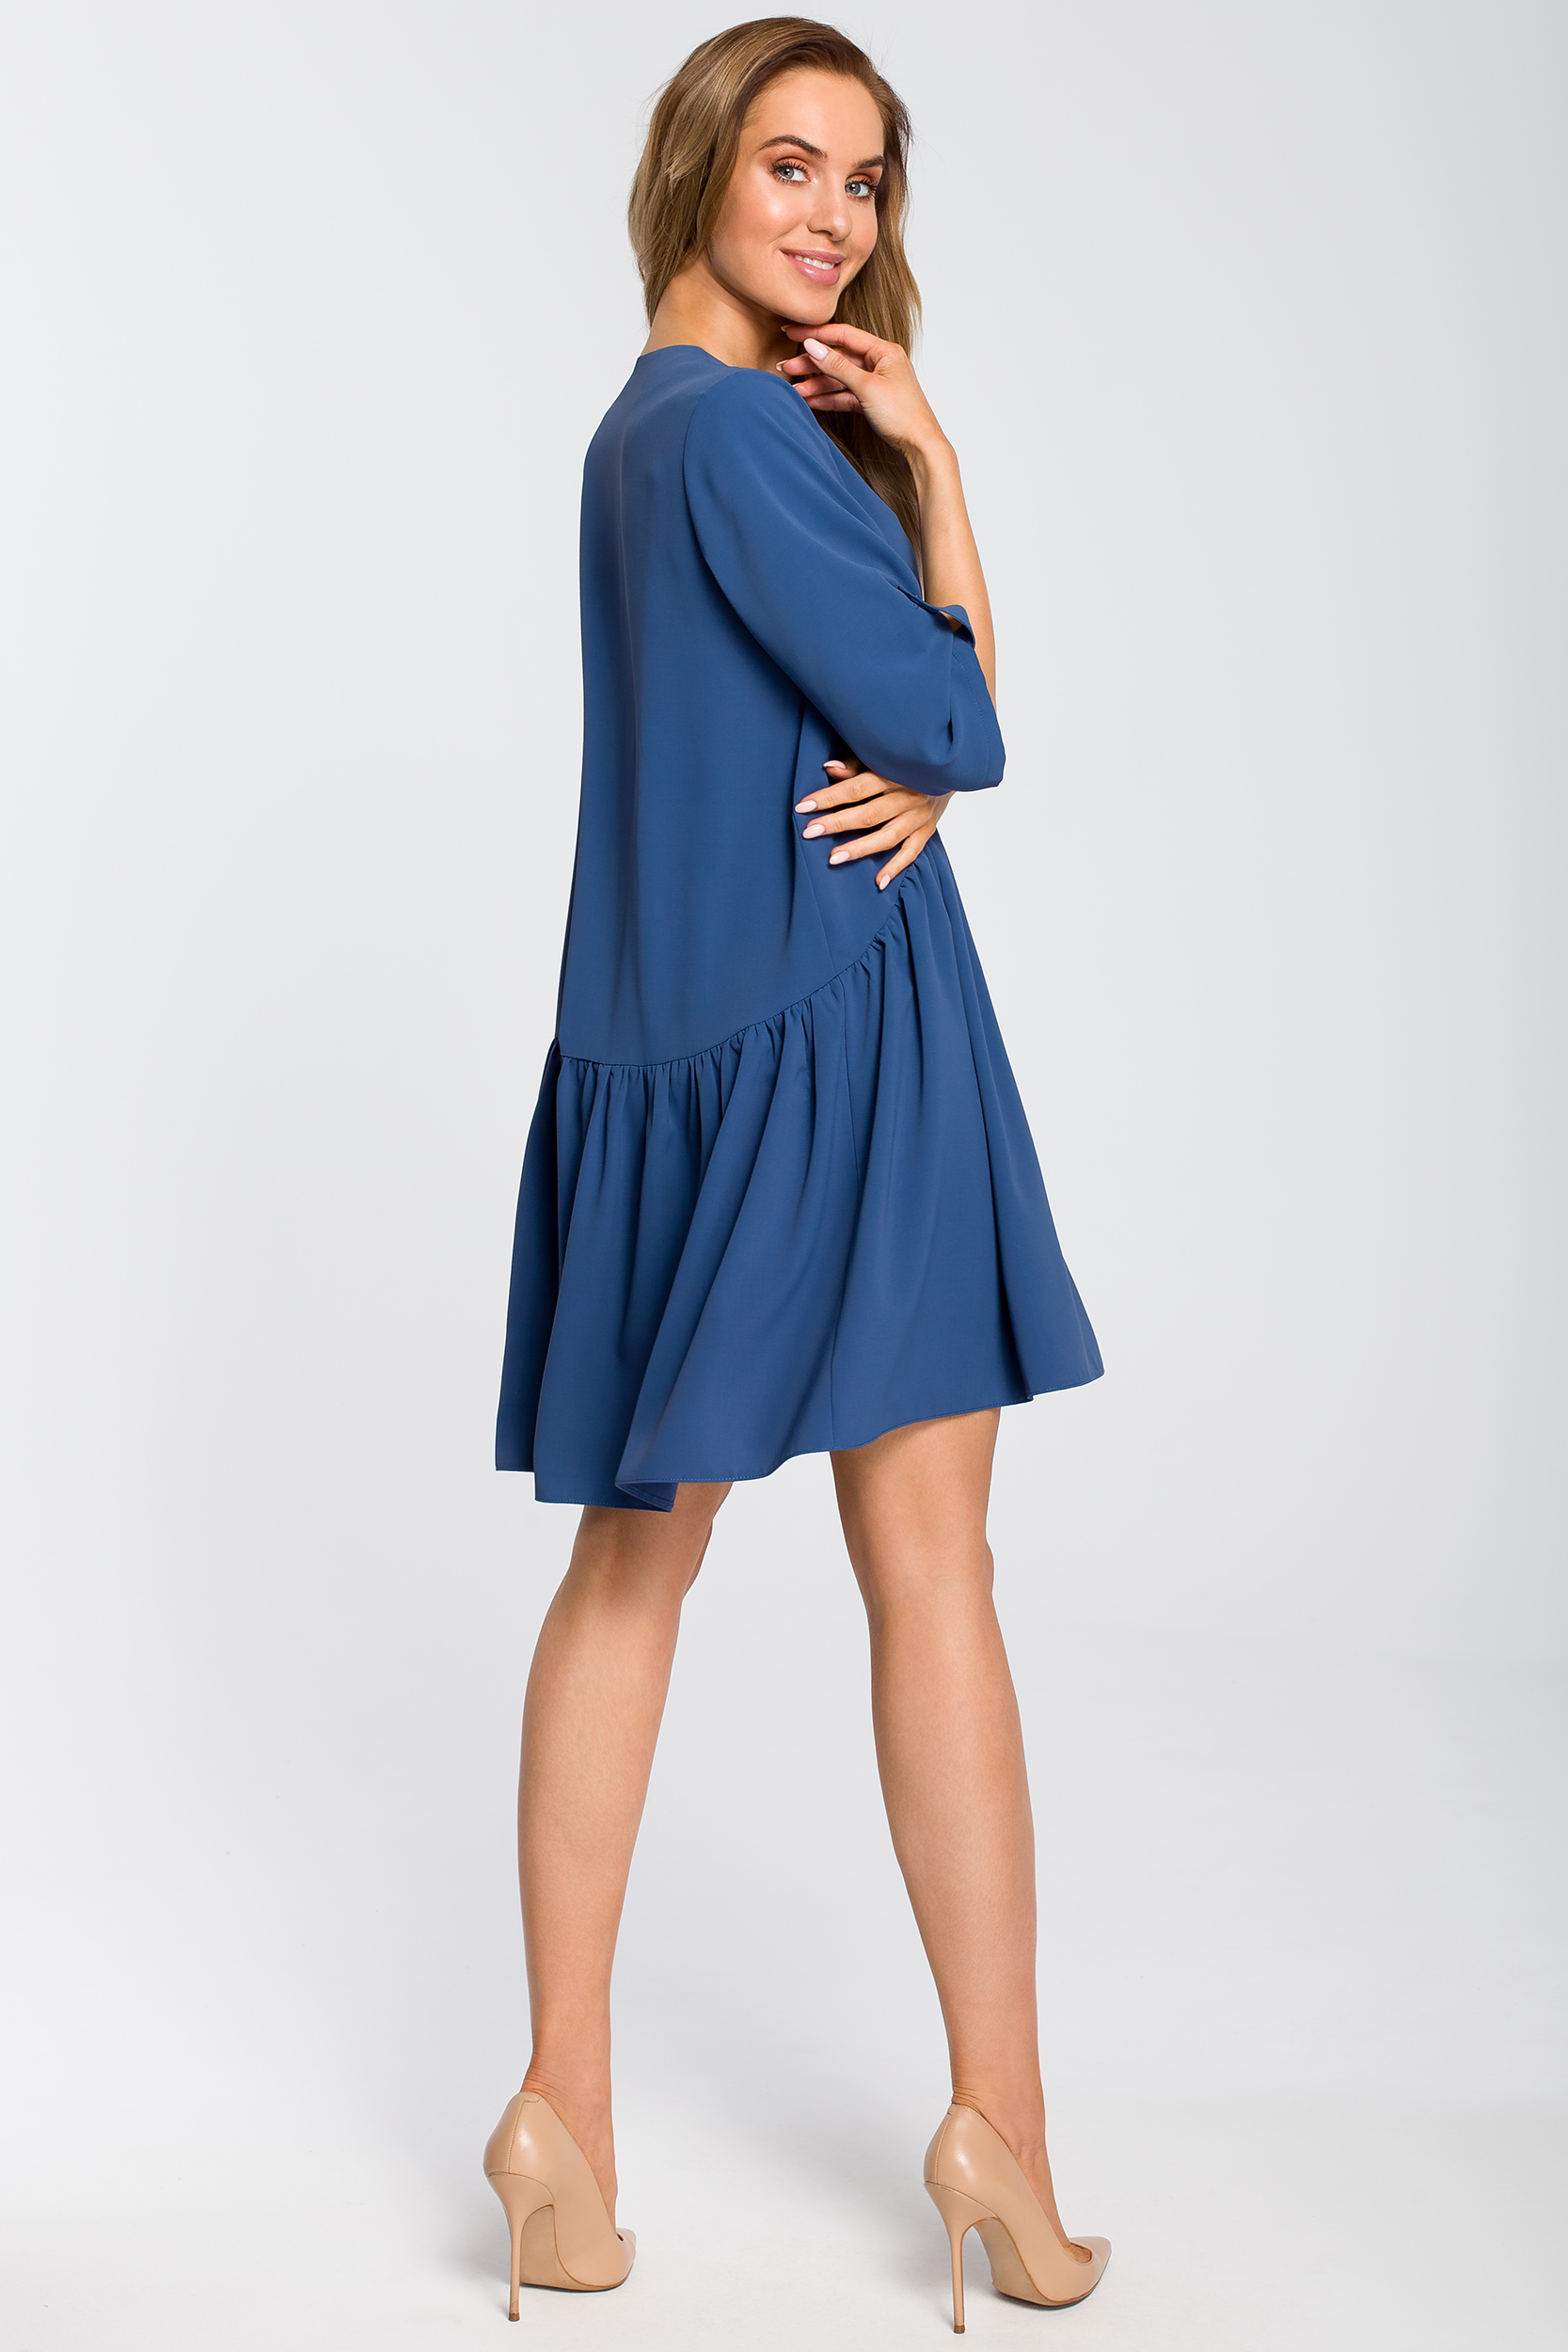 CM4108 Luźna sukienka rozkloszowana - niebieska